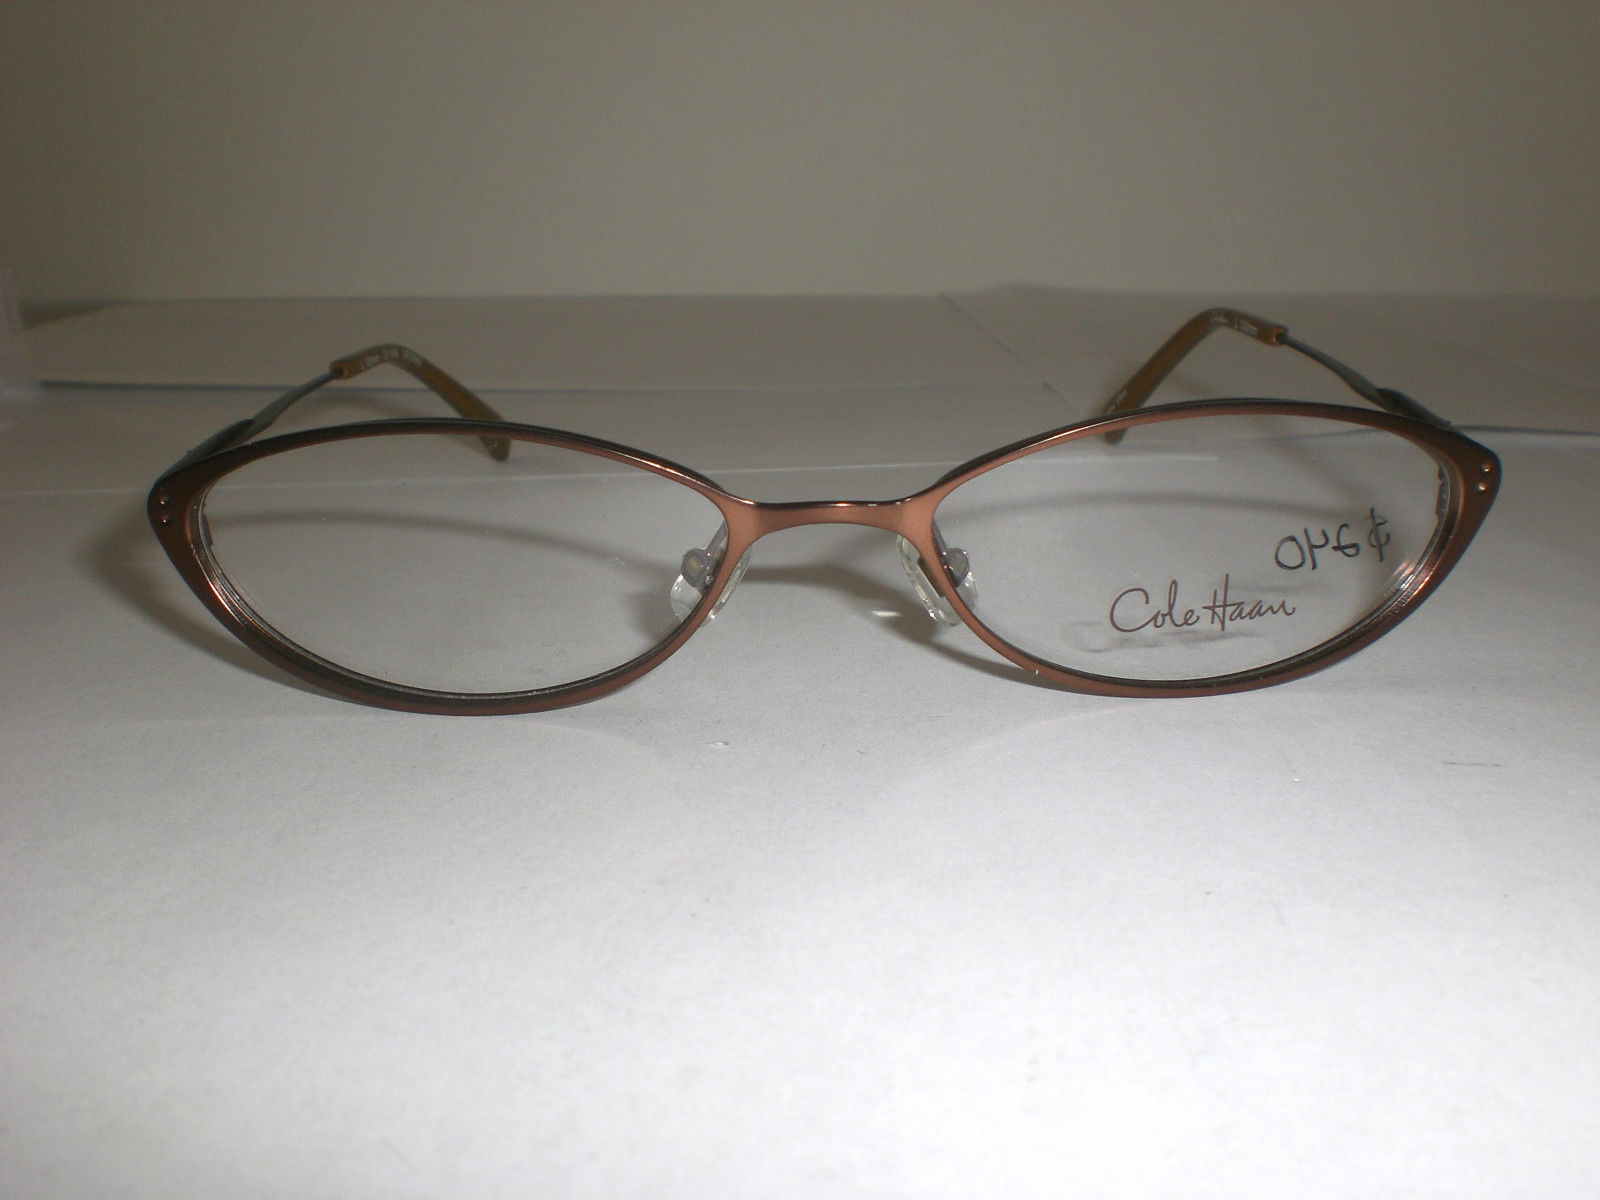 Cole Haan Designer Eyeglasses Frames w/Demo and 50 similar items